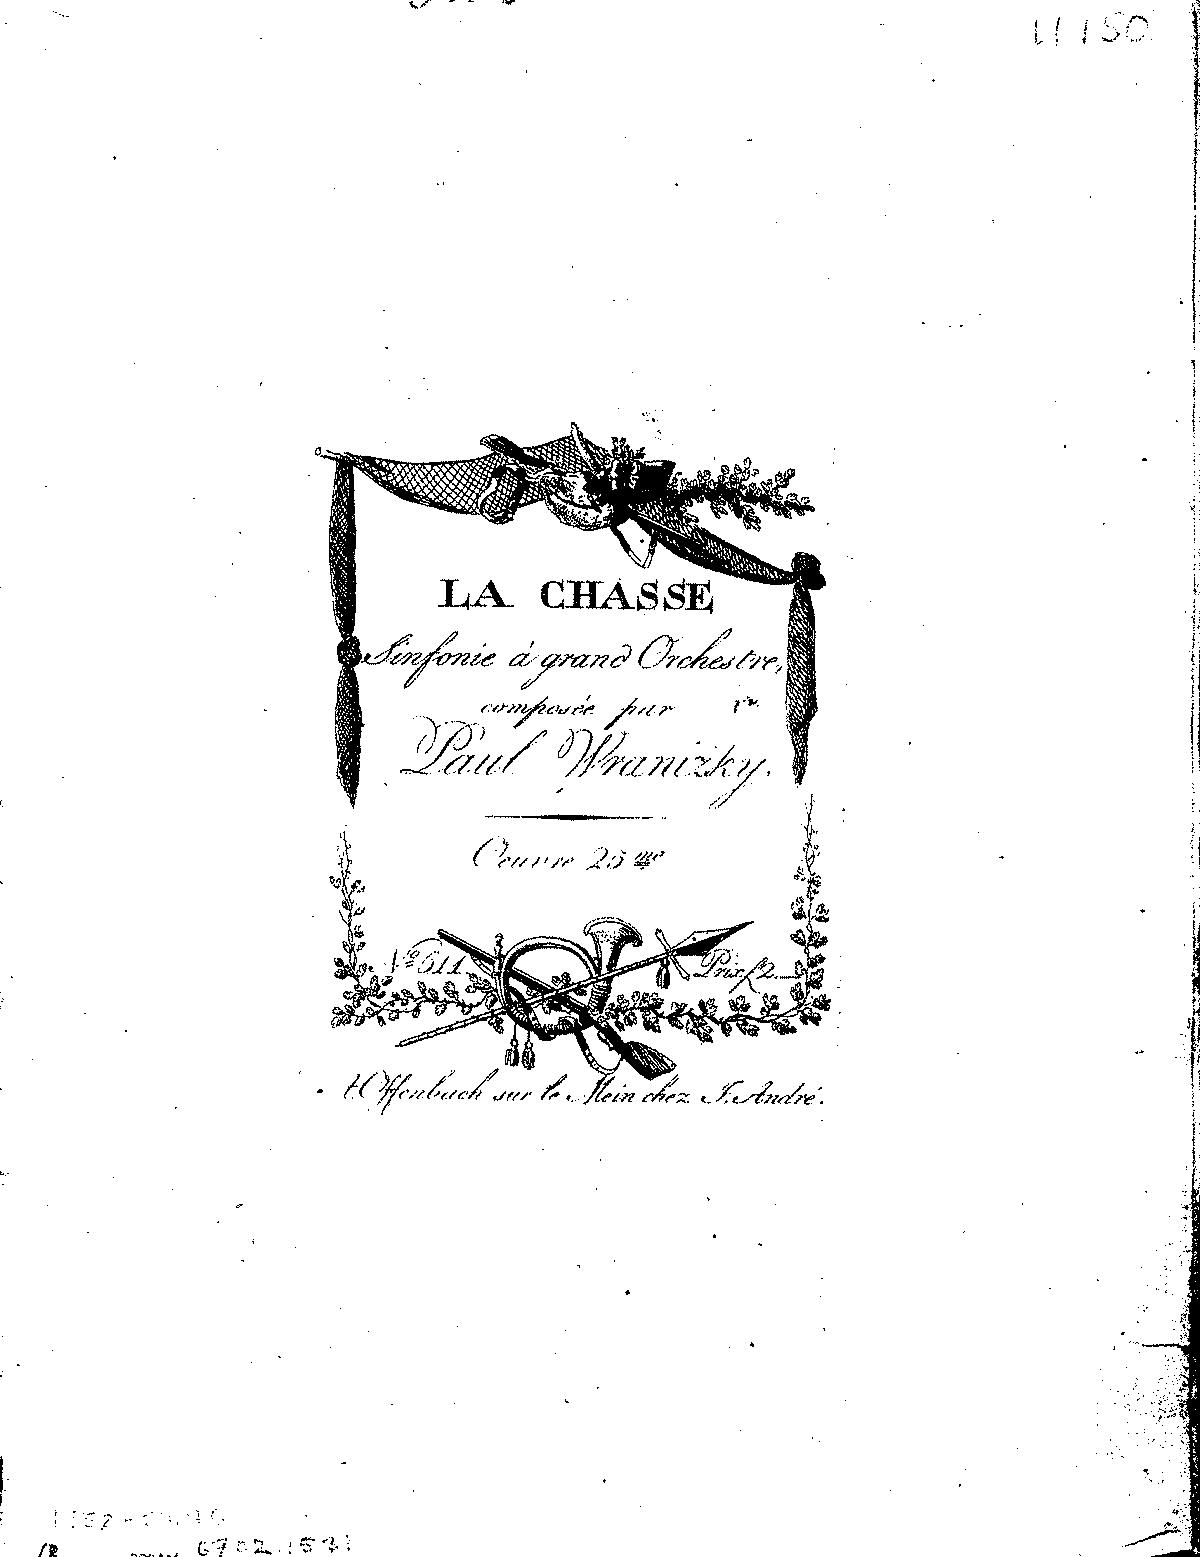 Symphony in D major, 'La Chasse', Op.25 (Wranitzky, Paul